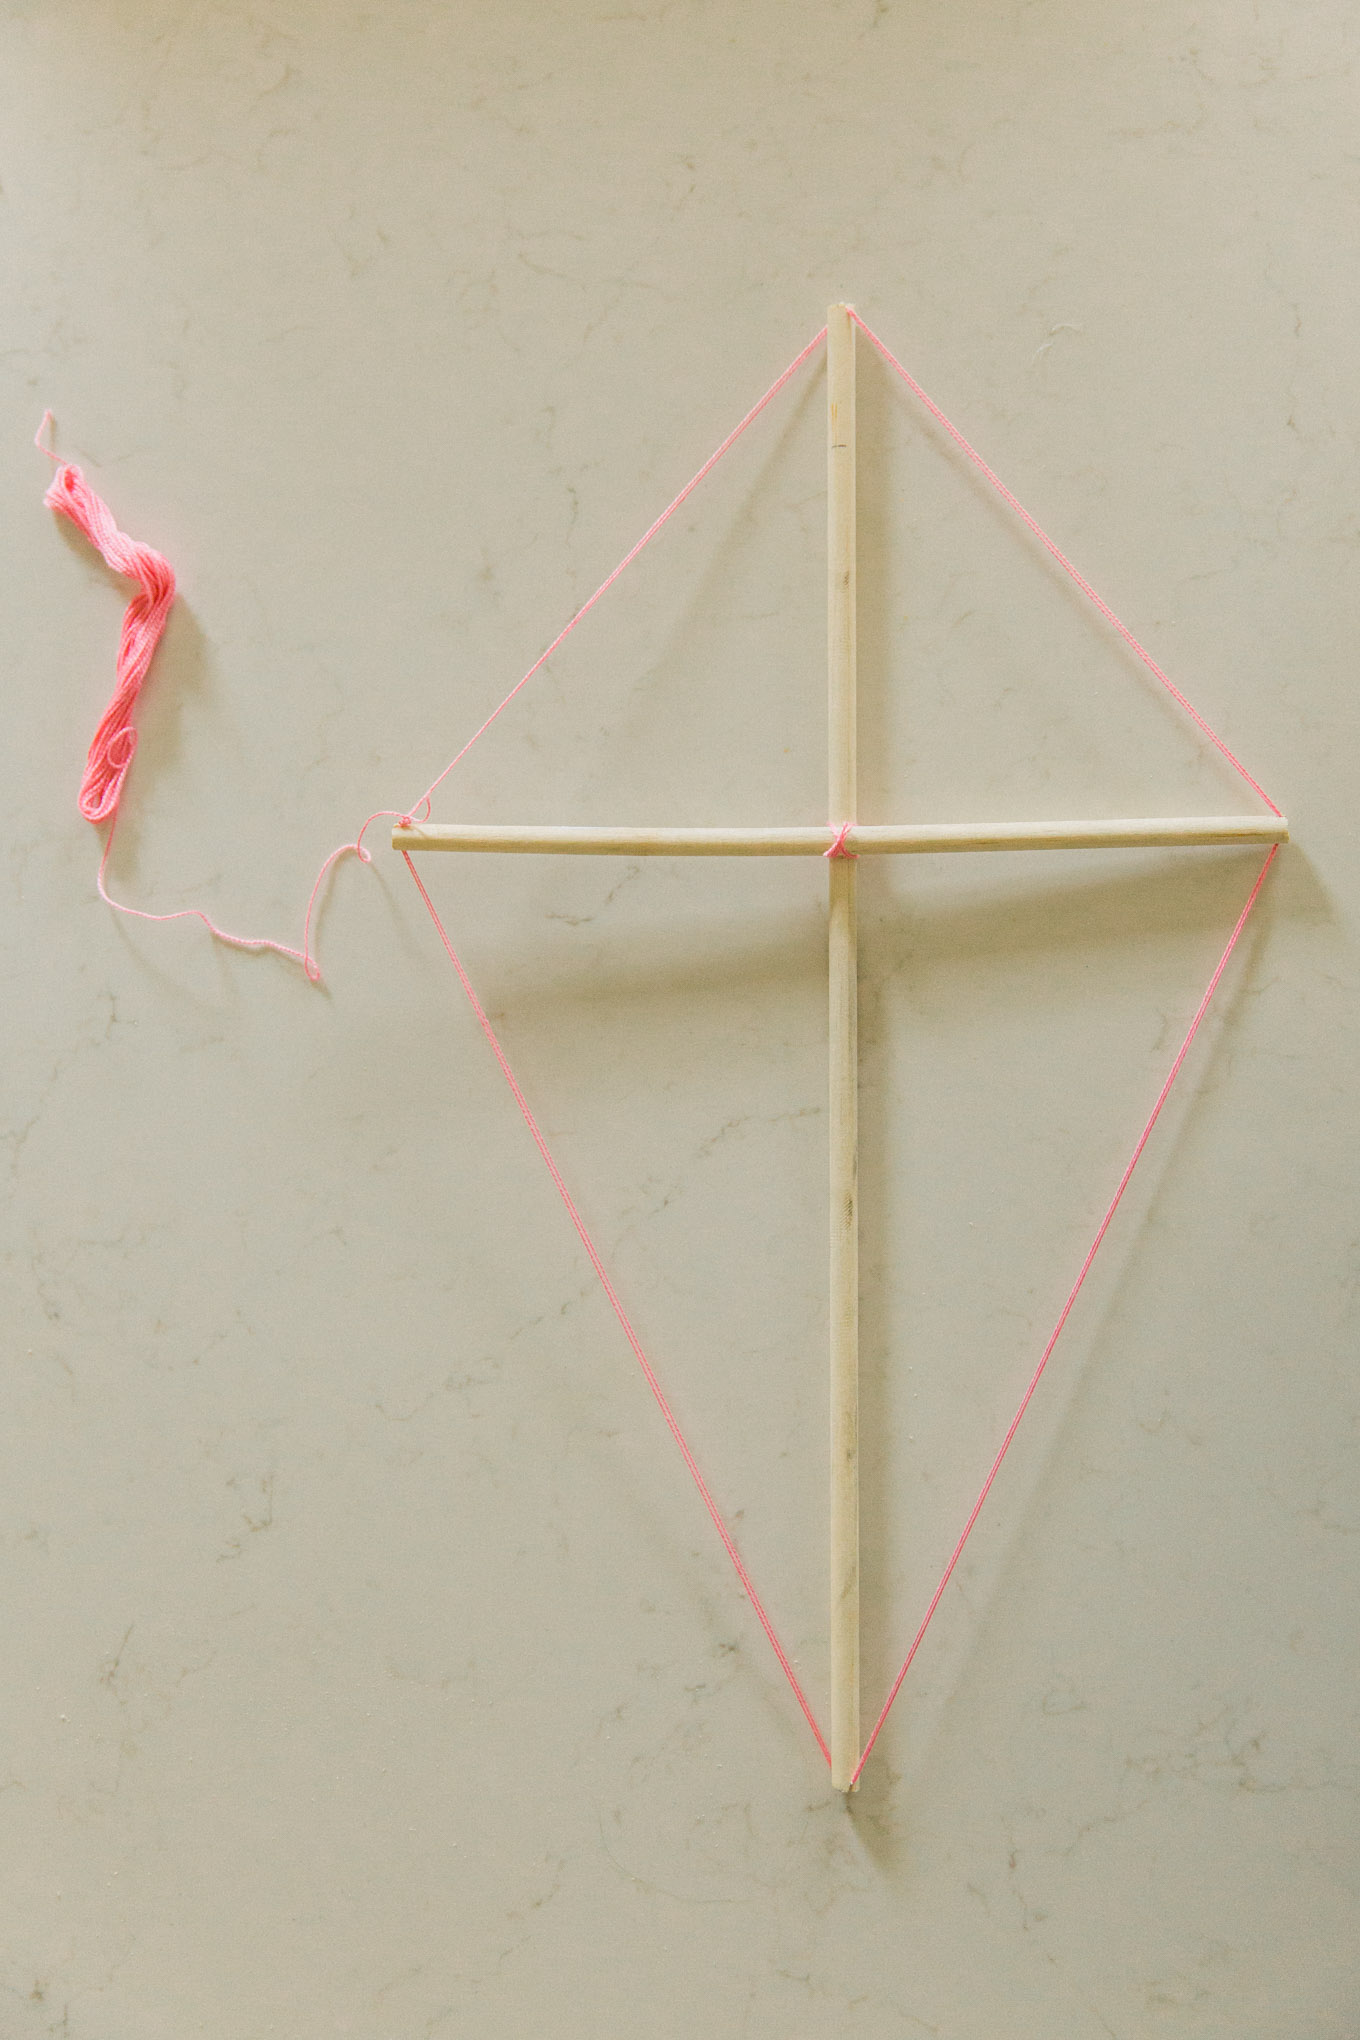 DIY old fashioned kite